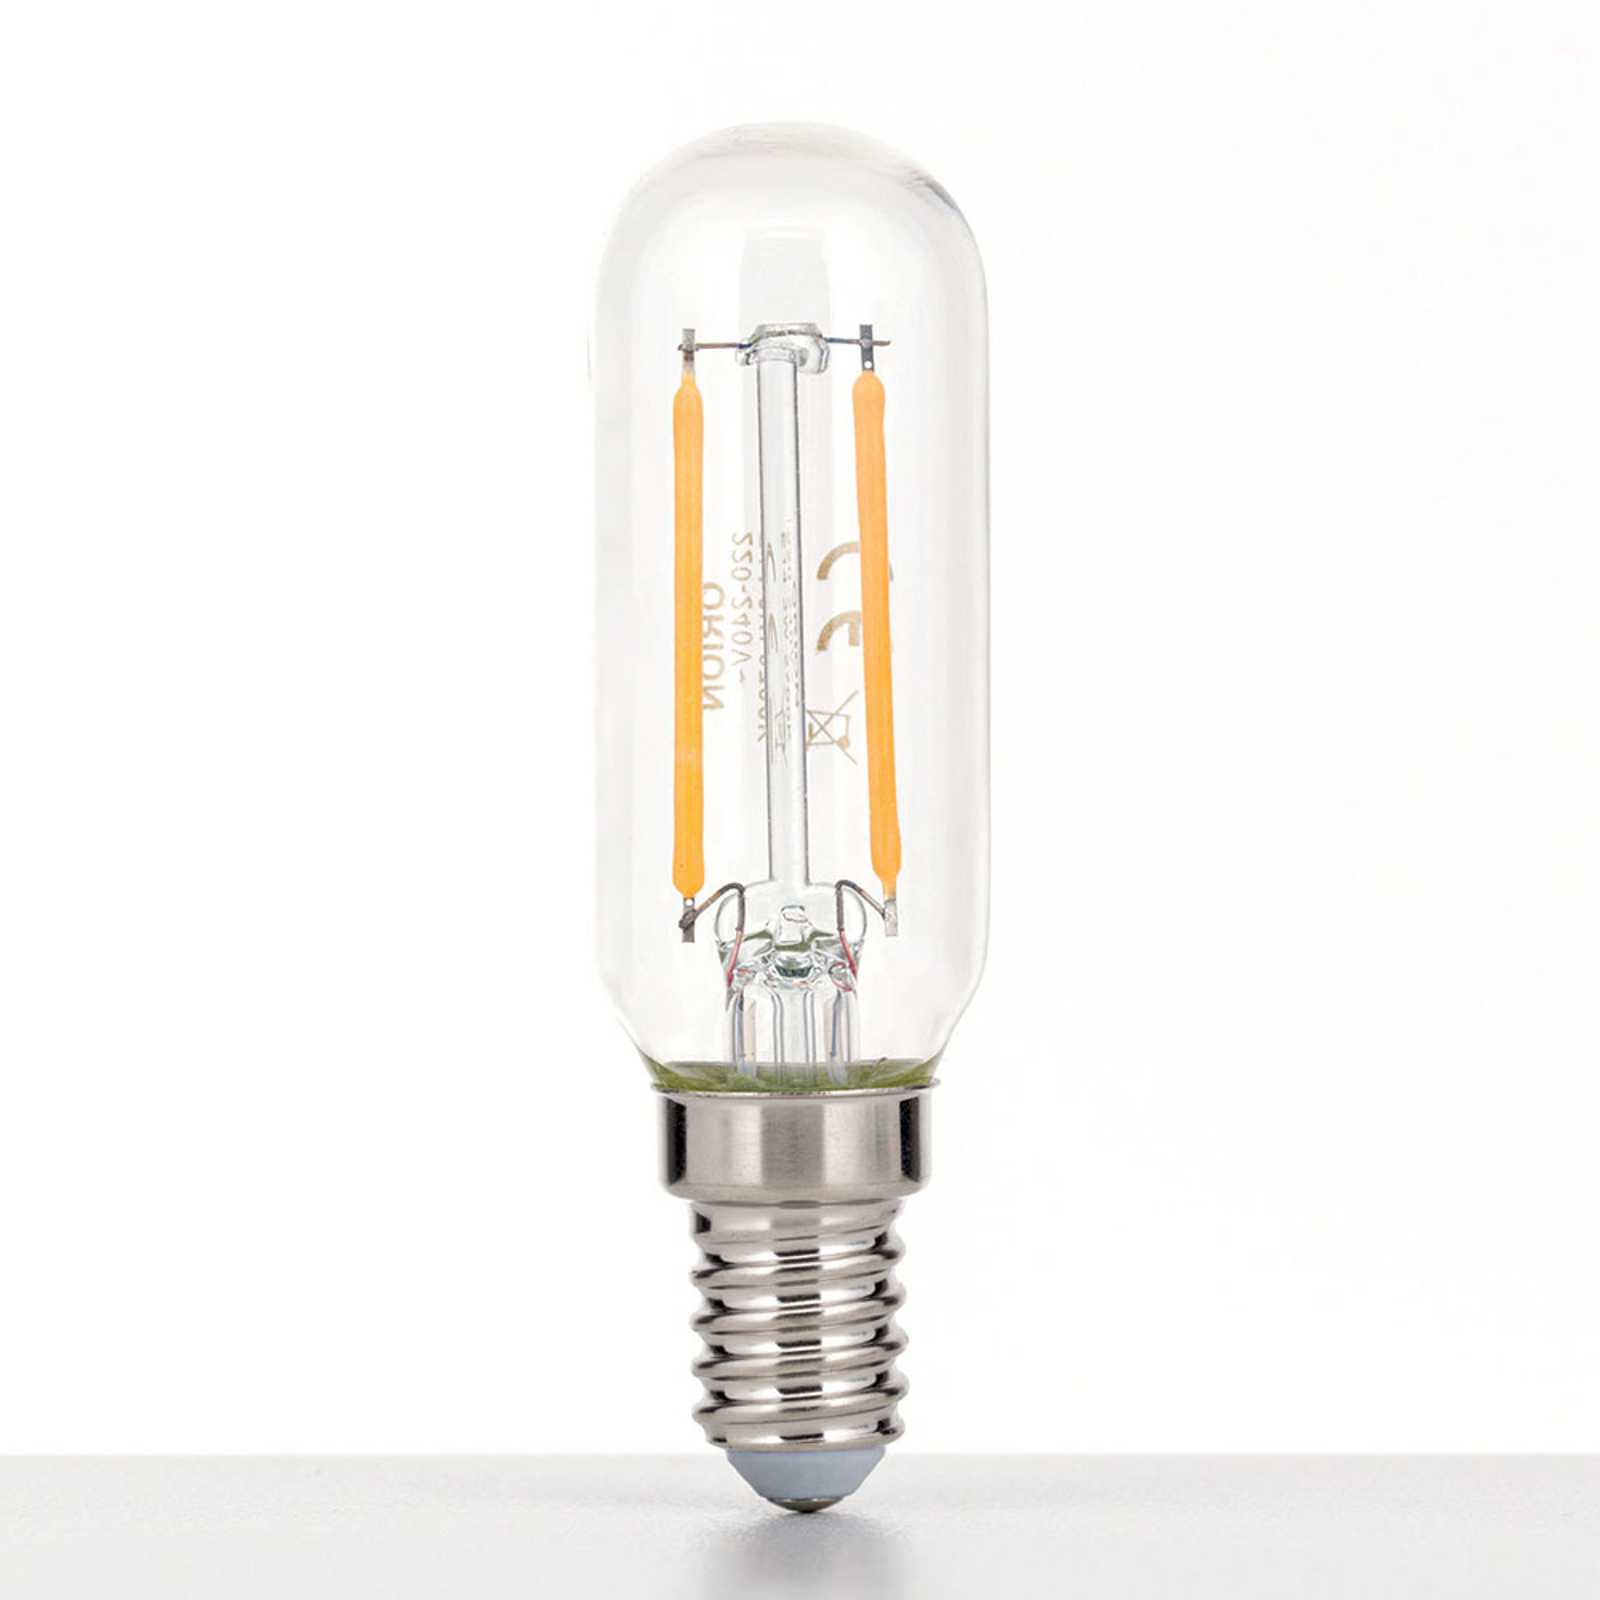 LED-lampe E14 3W 2700K stavform, klar